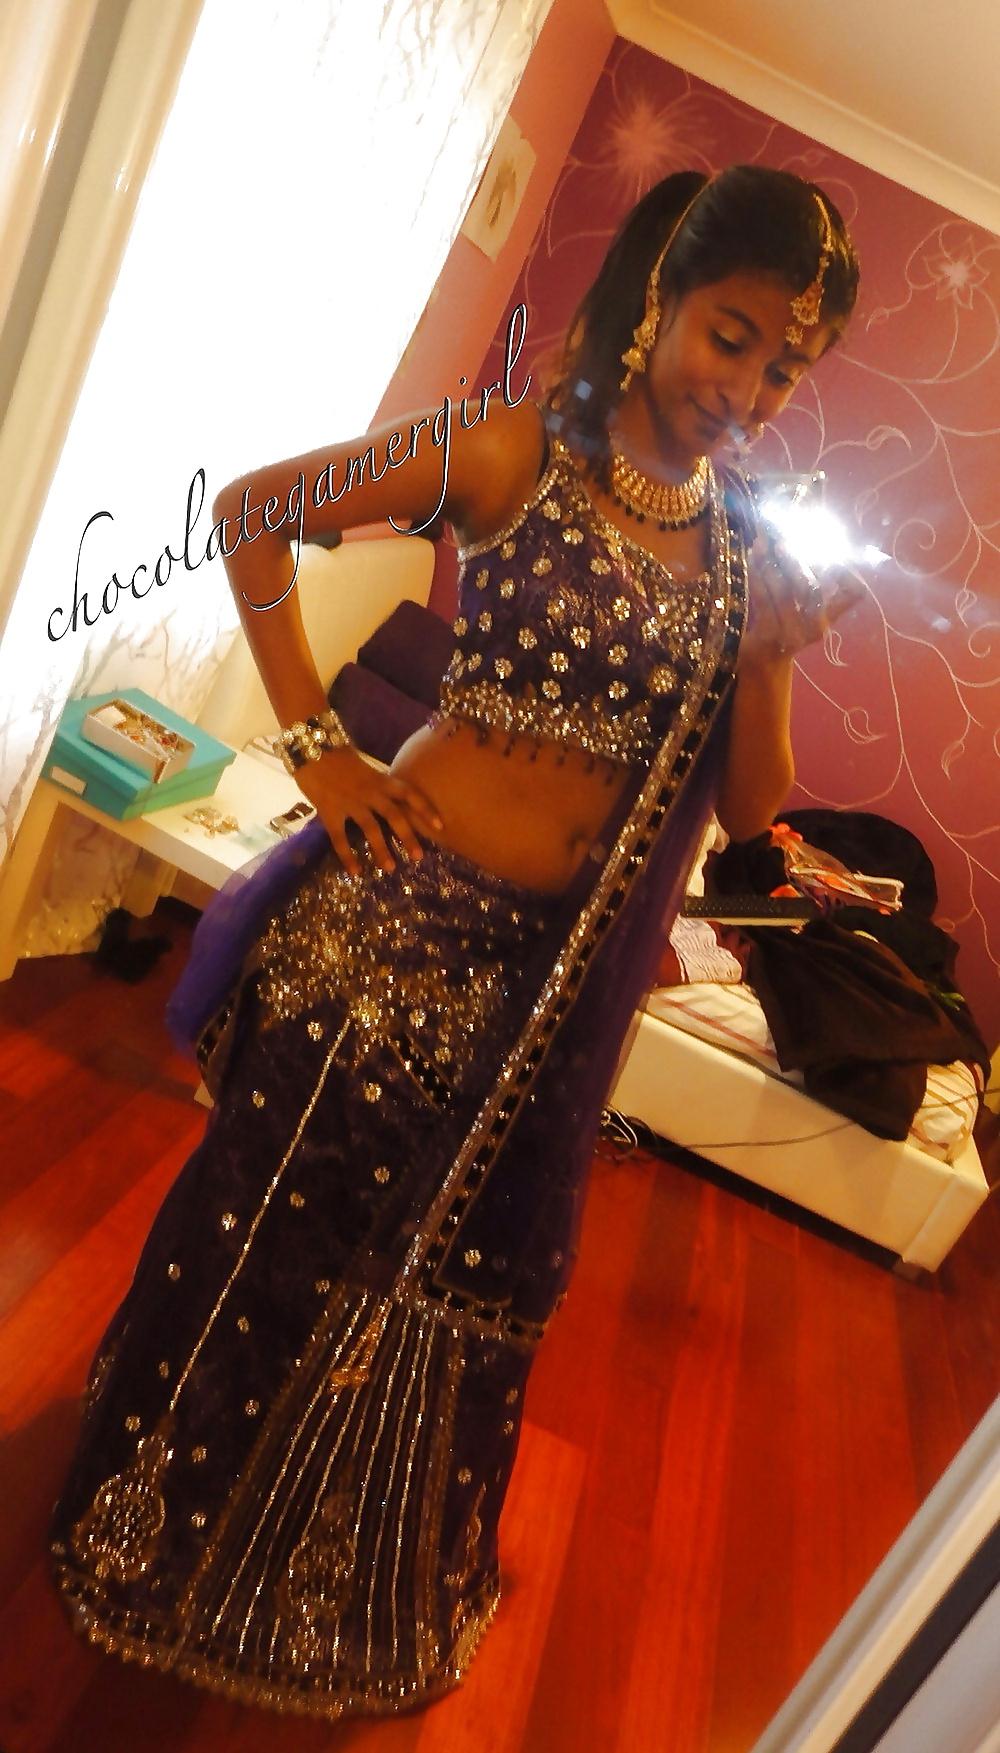 hot girl indian selfie nude body tits 4 - hot girl indian selfie nude body tits